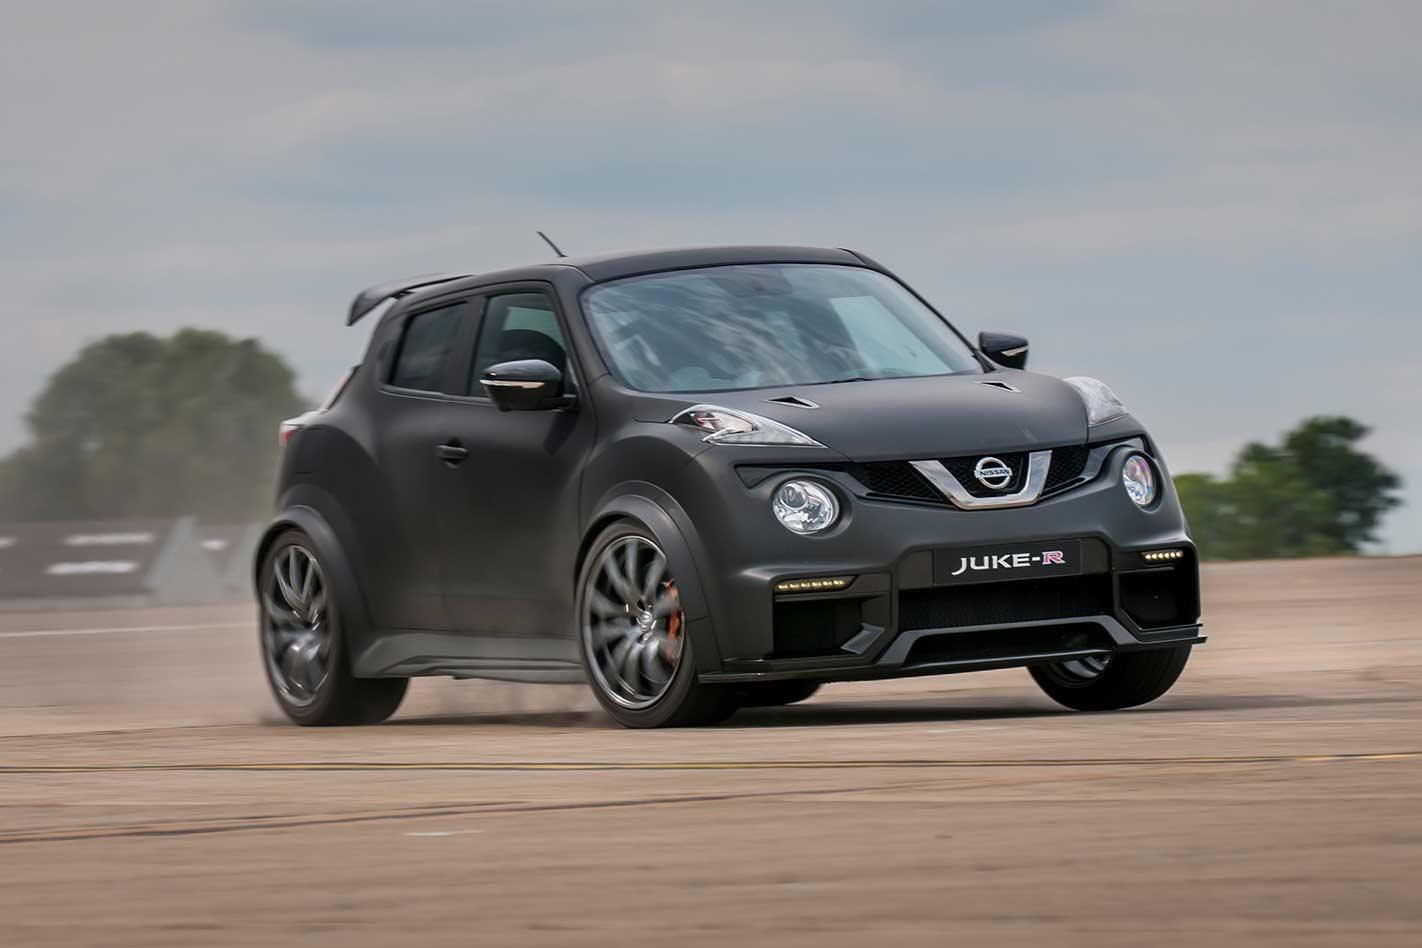 2011 Nissan Juke R Fast Car History Lesson